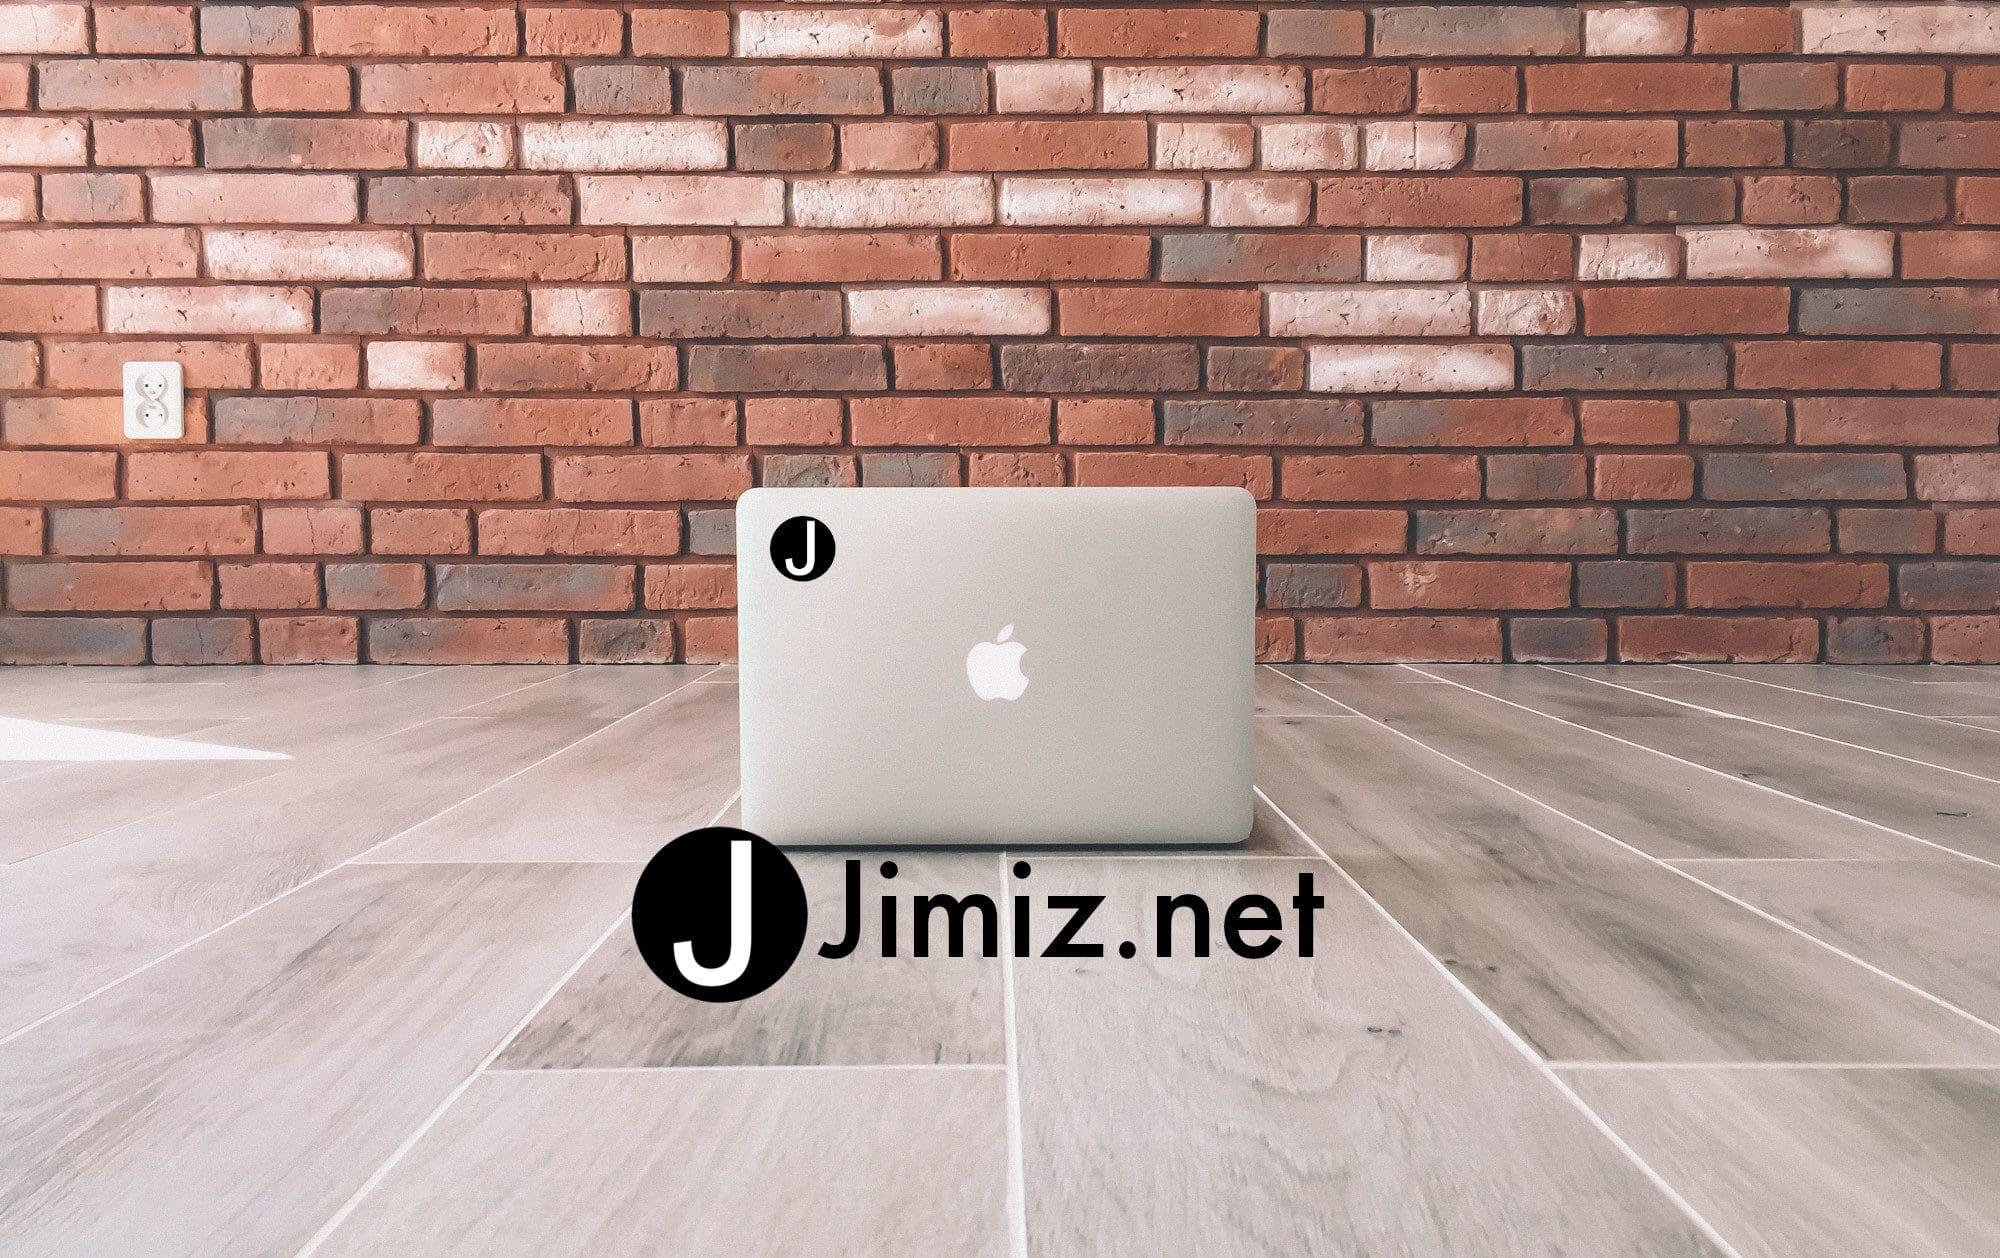 Jimiz.net